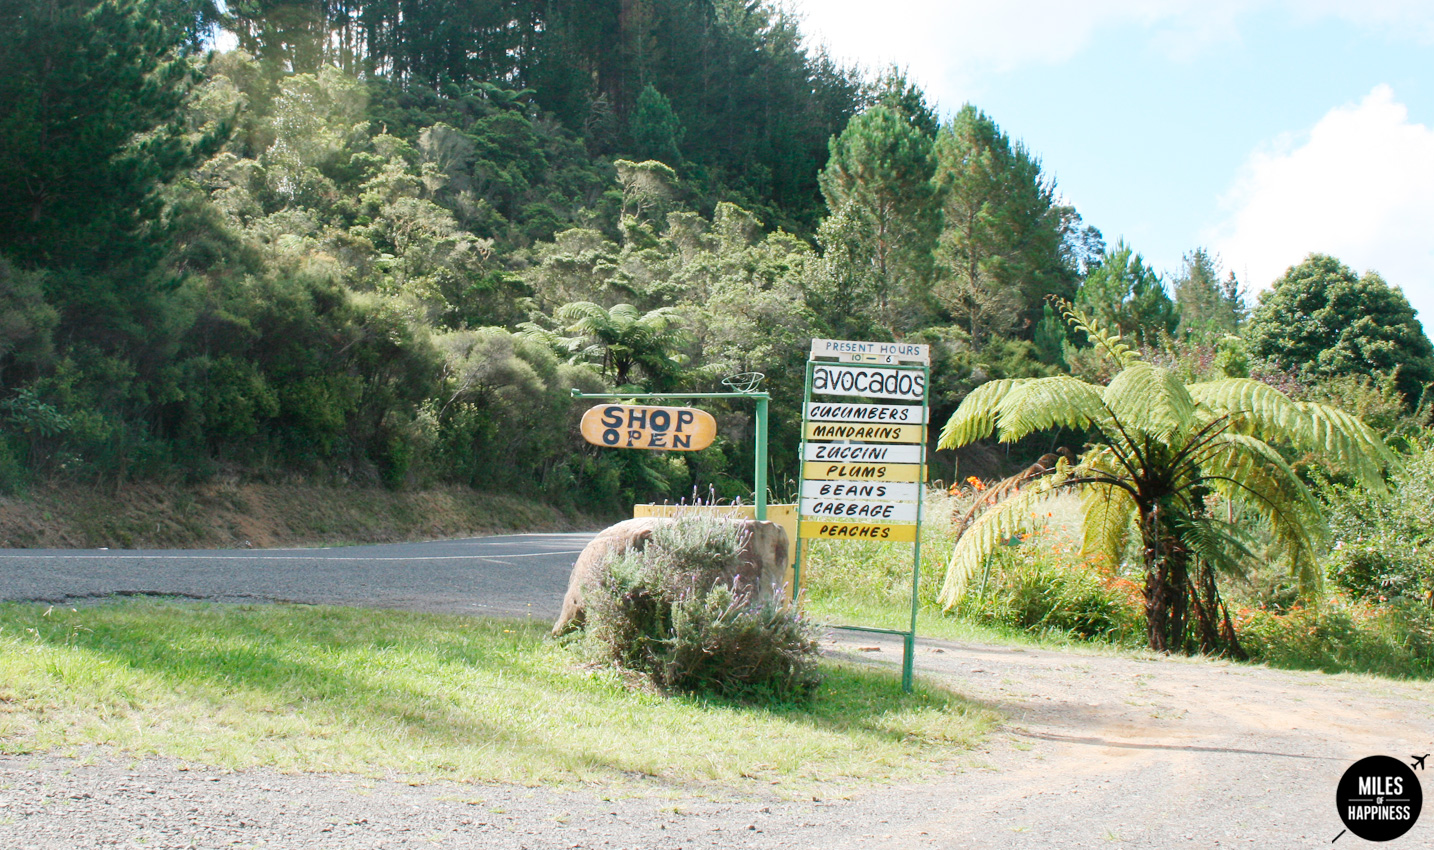 New Zealand: Itinerary of a road trip in the Coromandel Peninsula